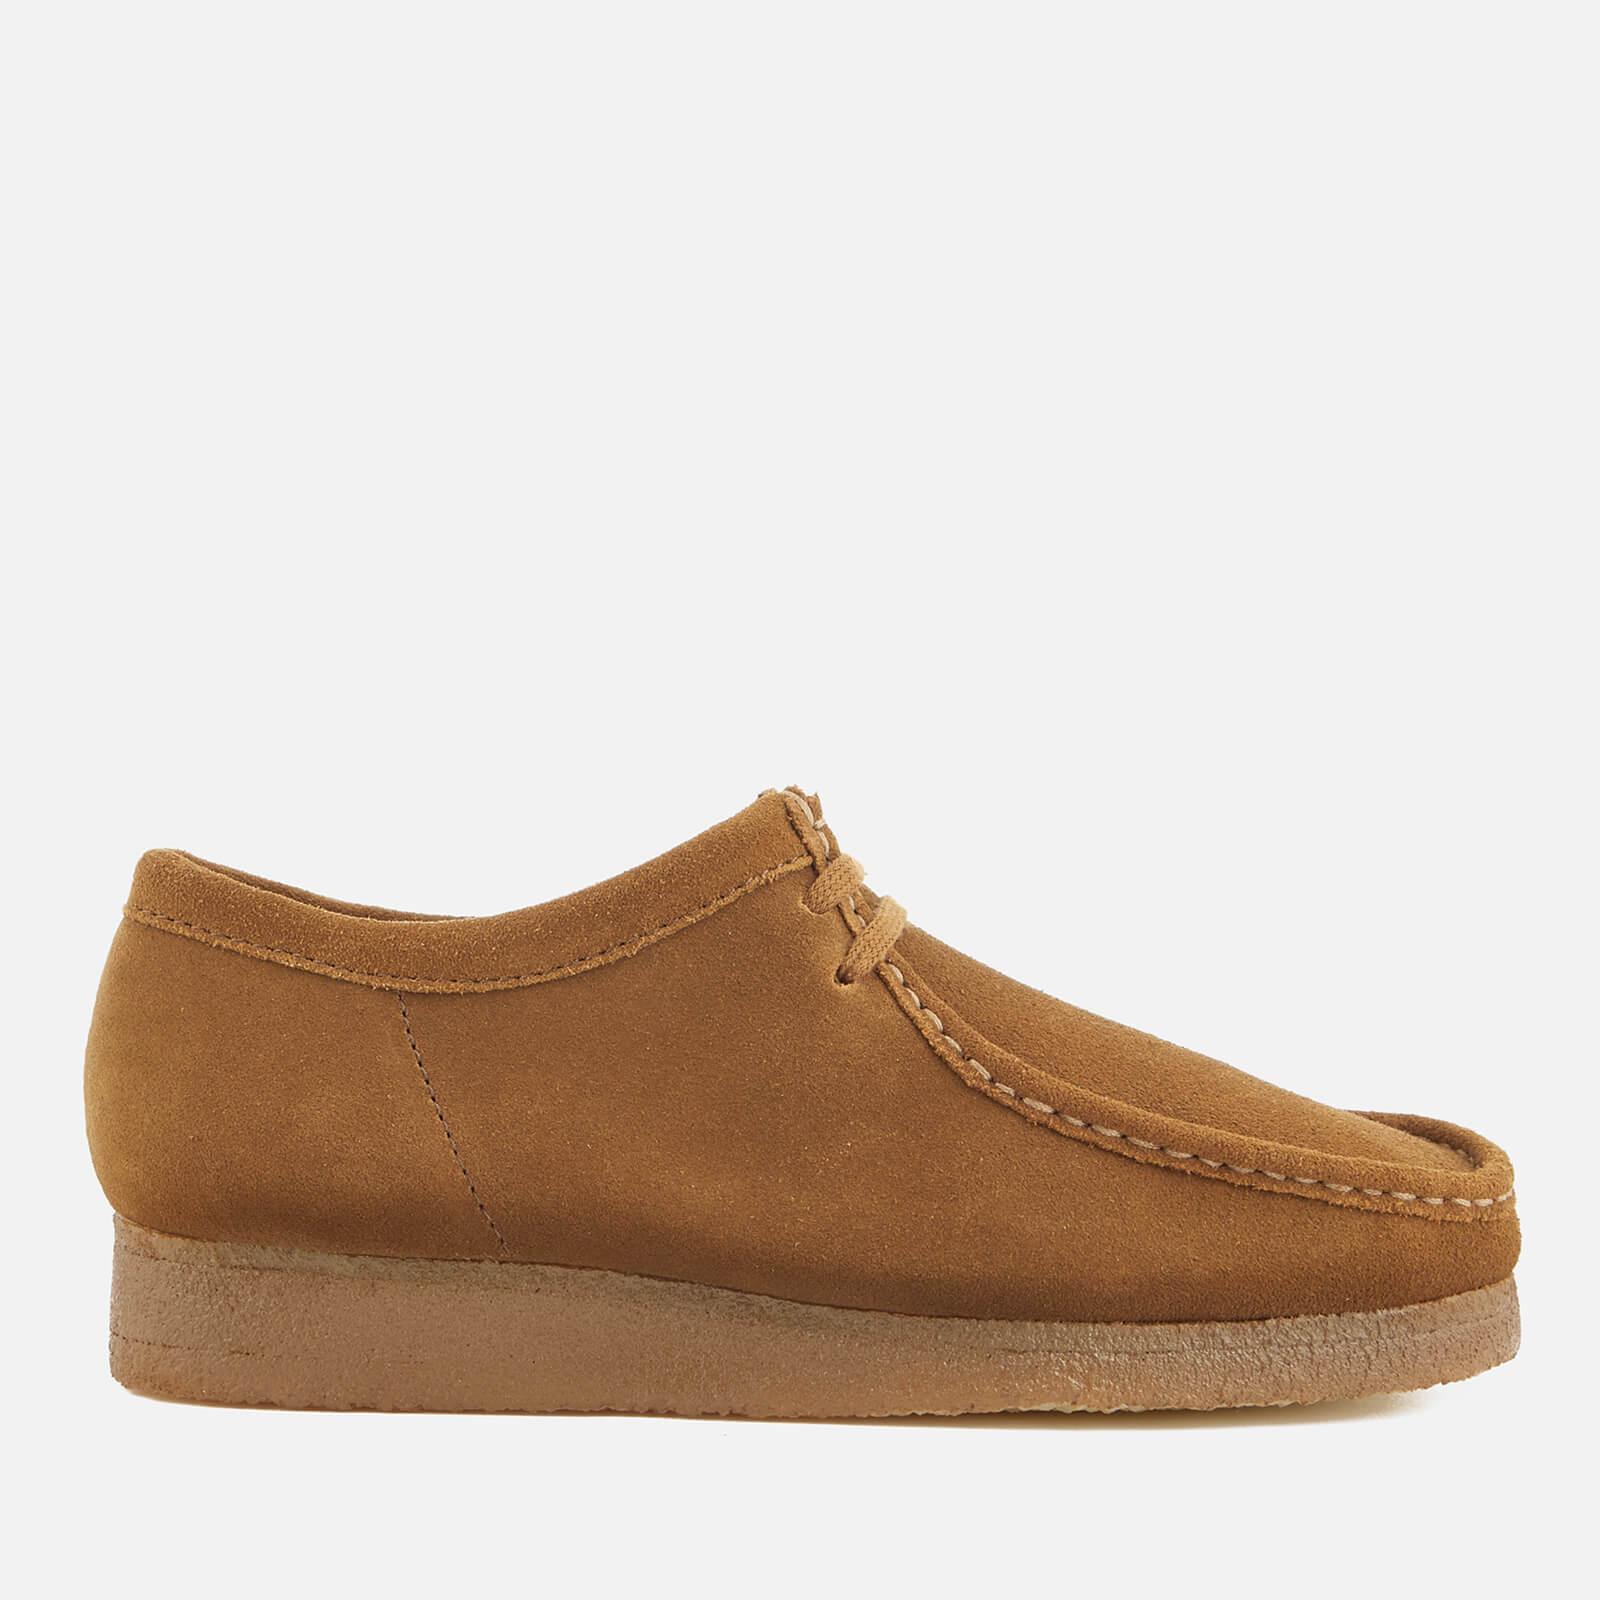 Clarks Originals Men's Wallabee Suede Shoes - Cola - UK 10 - Tan